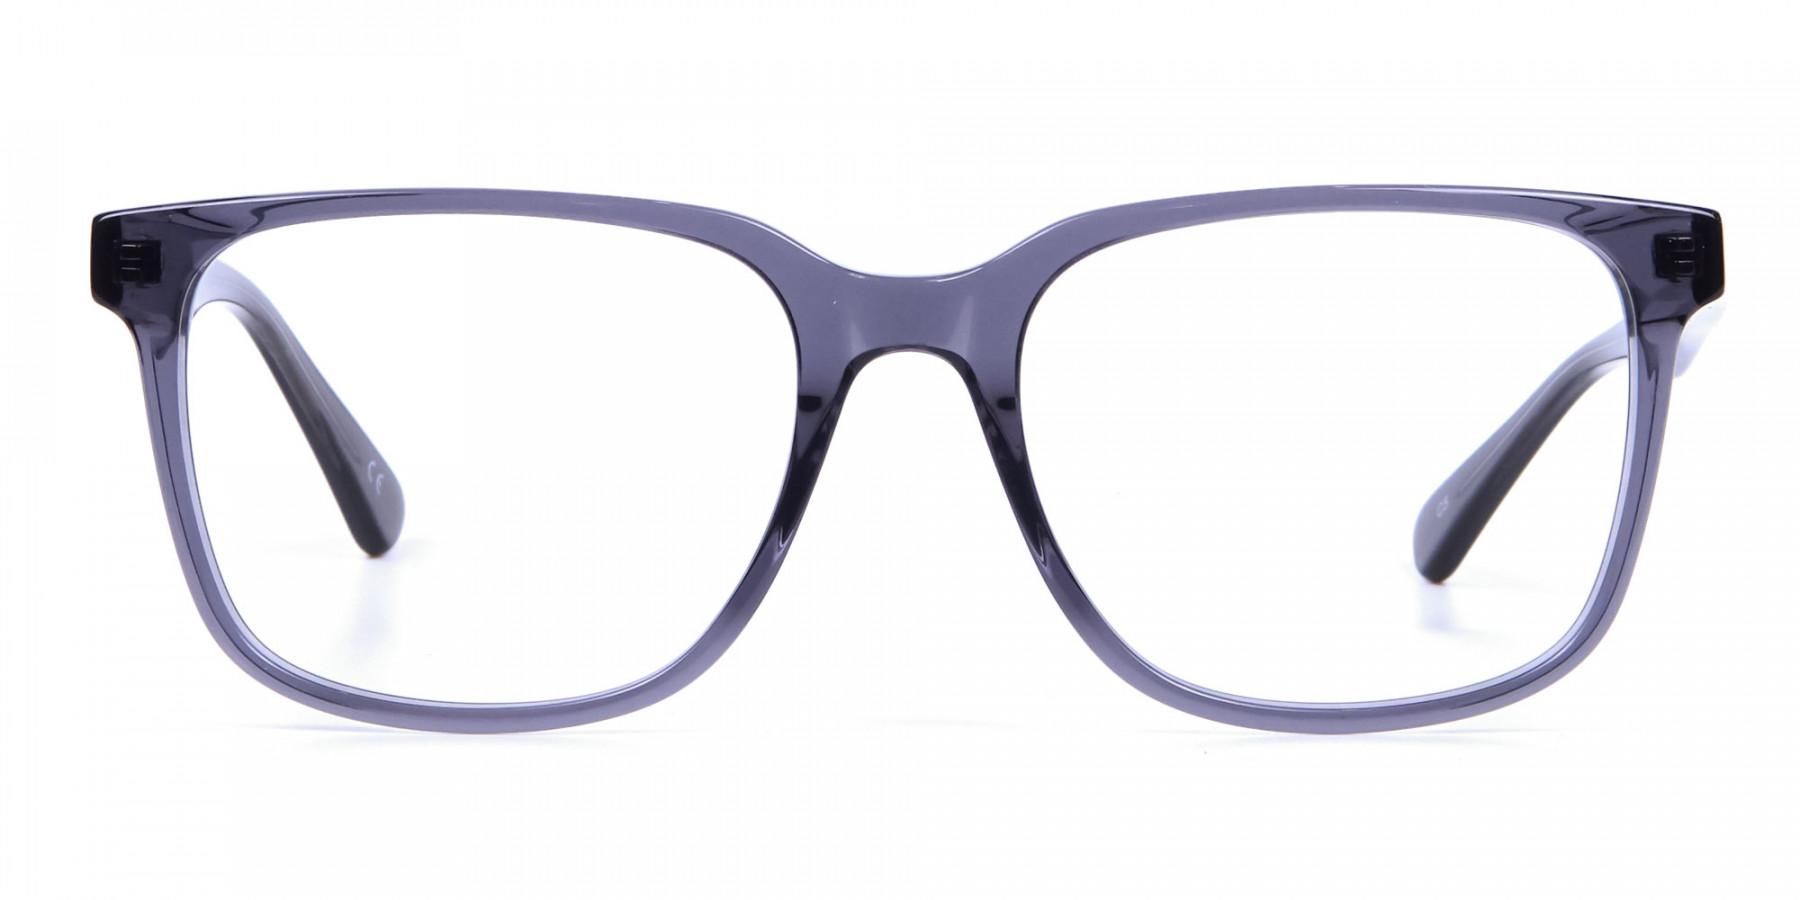 Transparent Grey Glasses